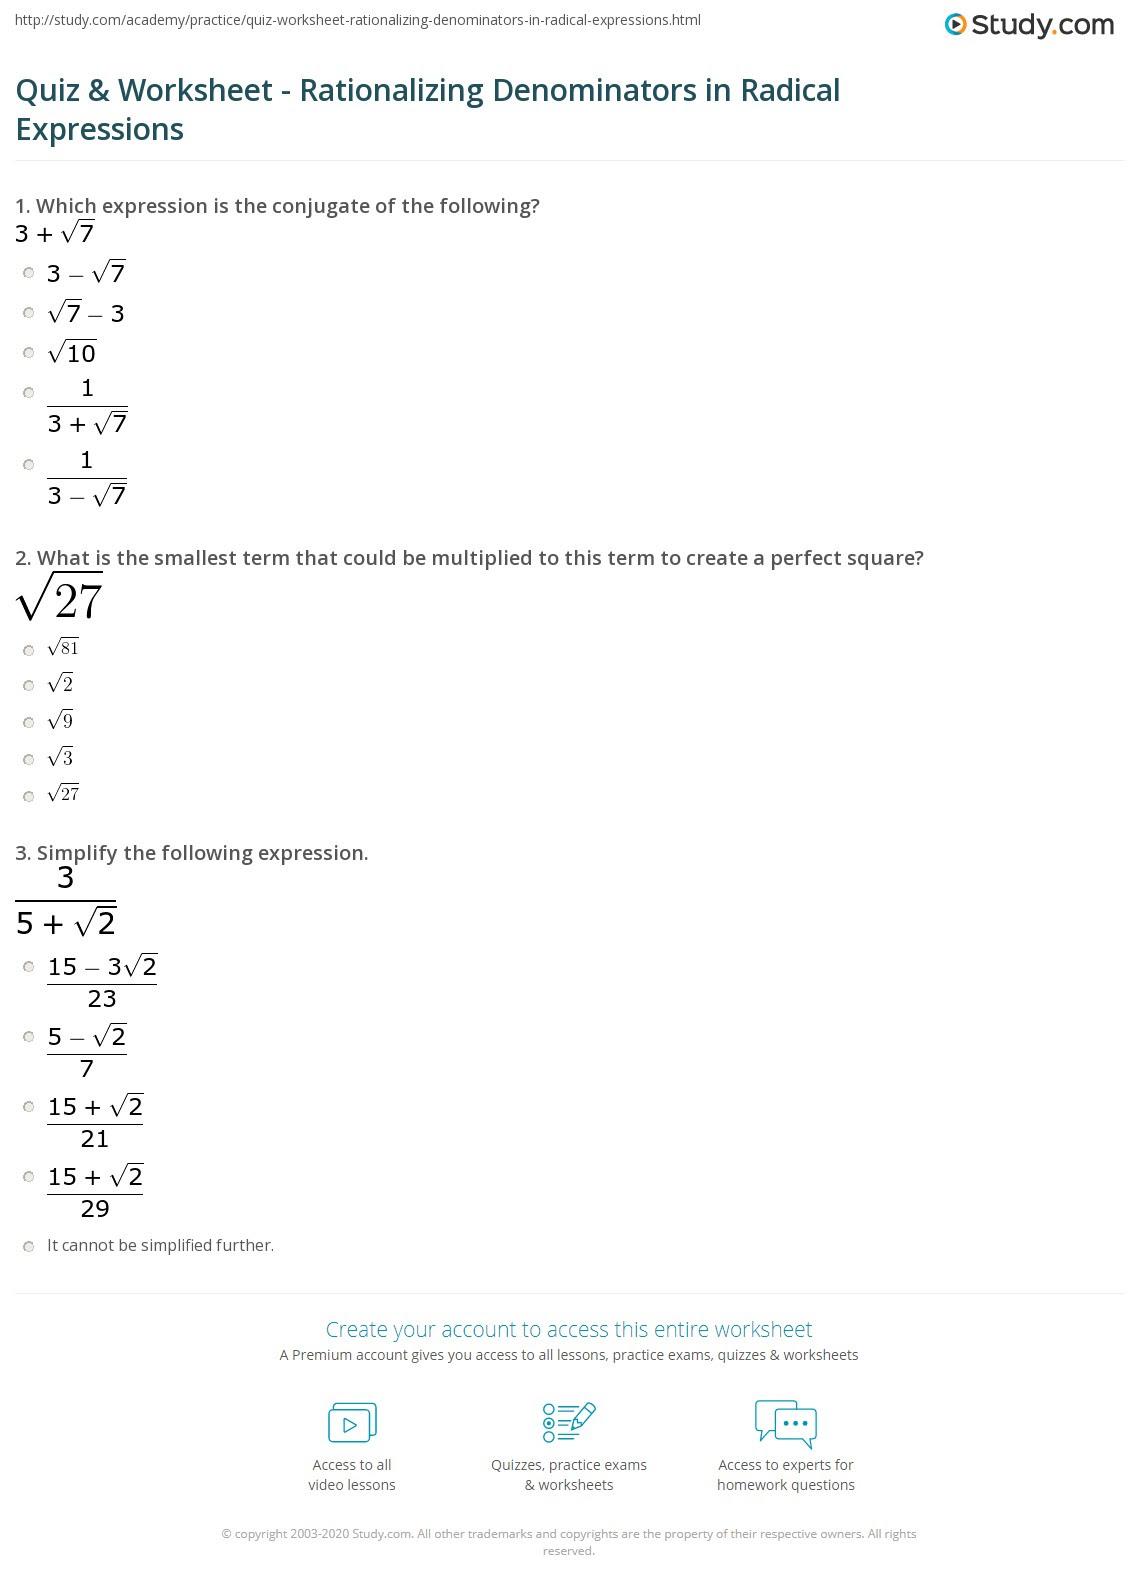 Multiplying Rational Expressions Worksheet Pdf  worksheets and nerd on pinterestopenalgebra